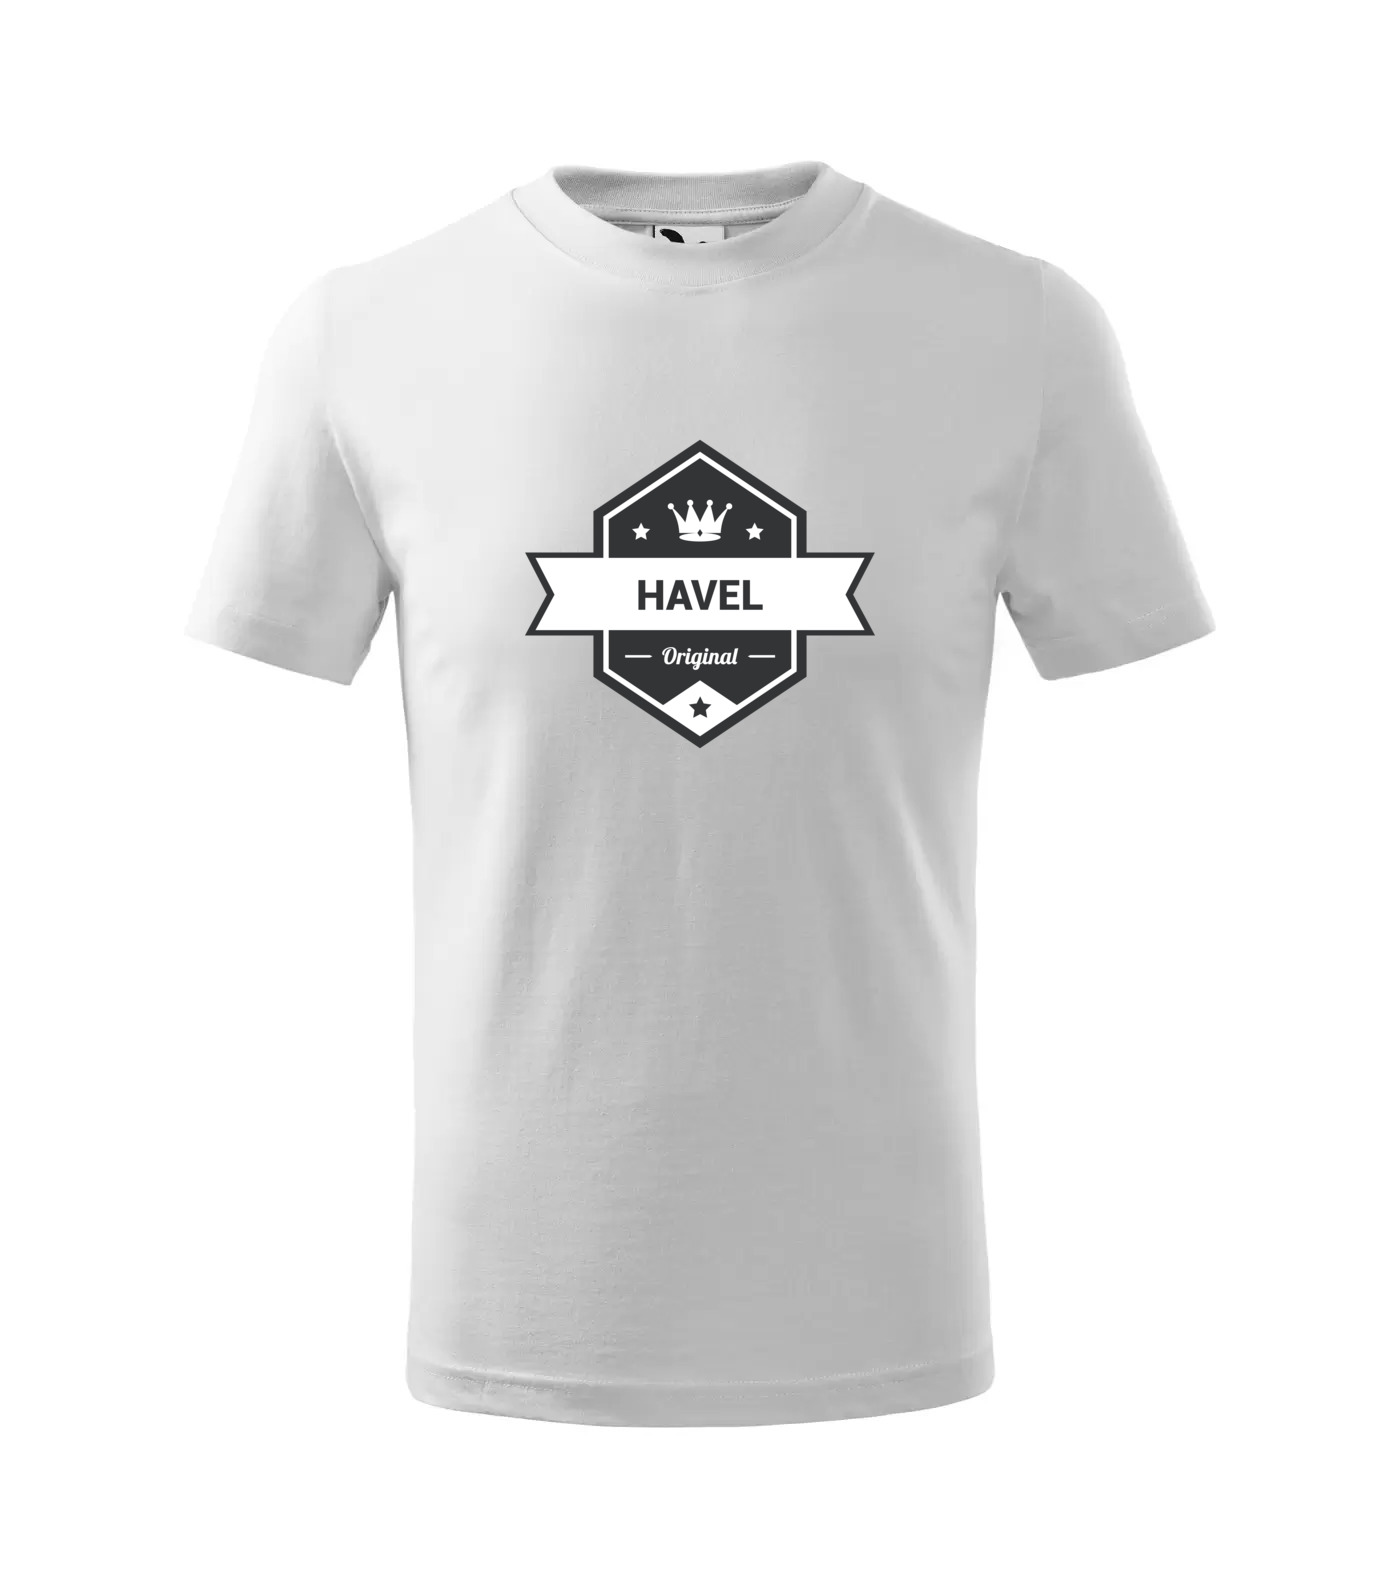 Tričko King Havel